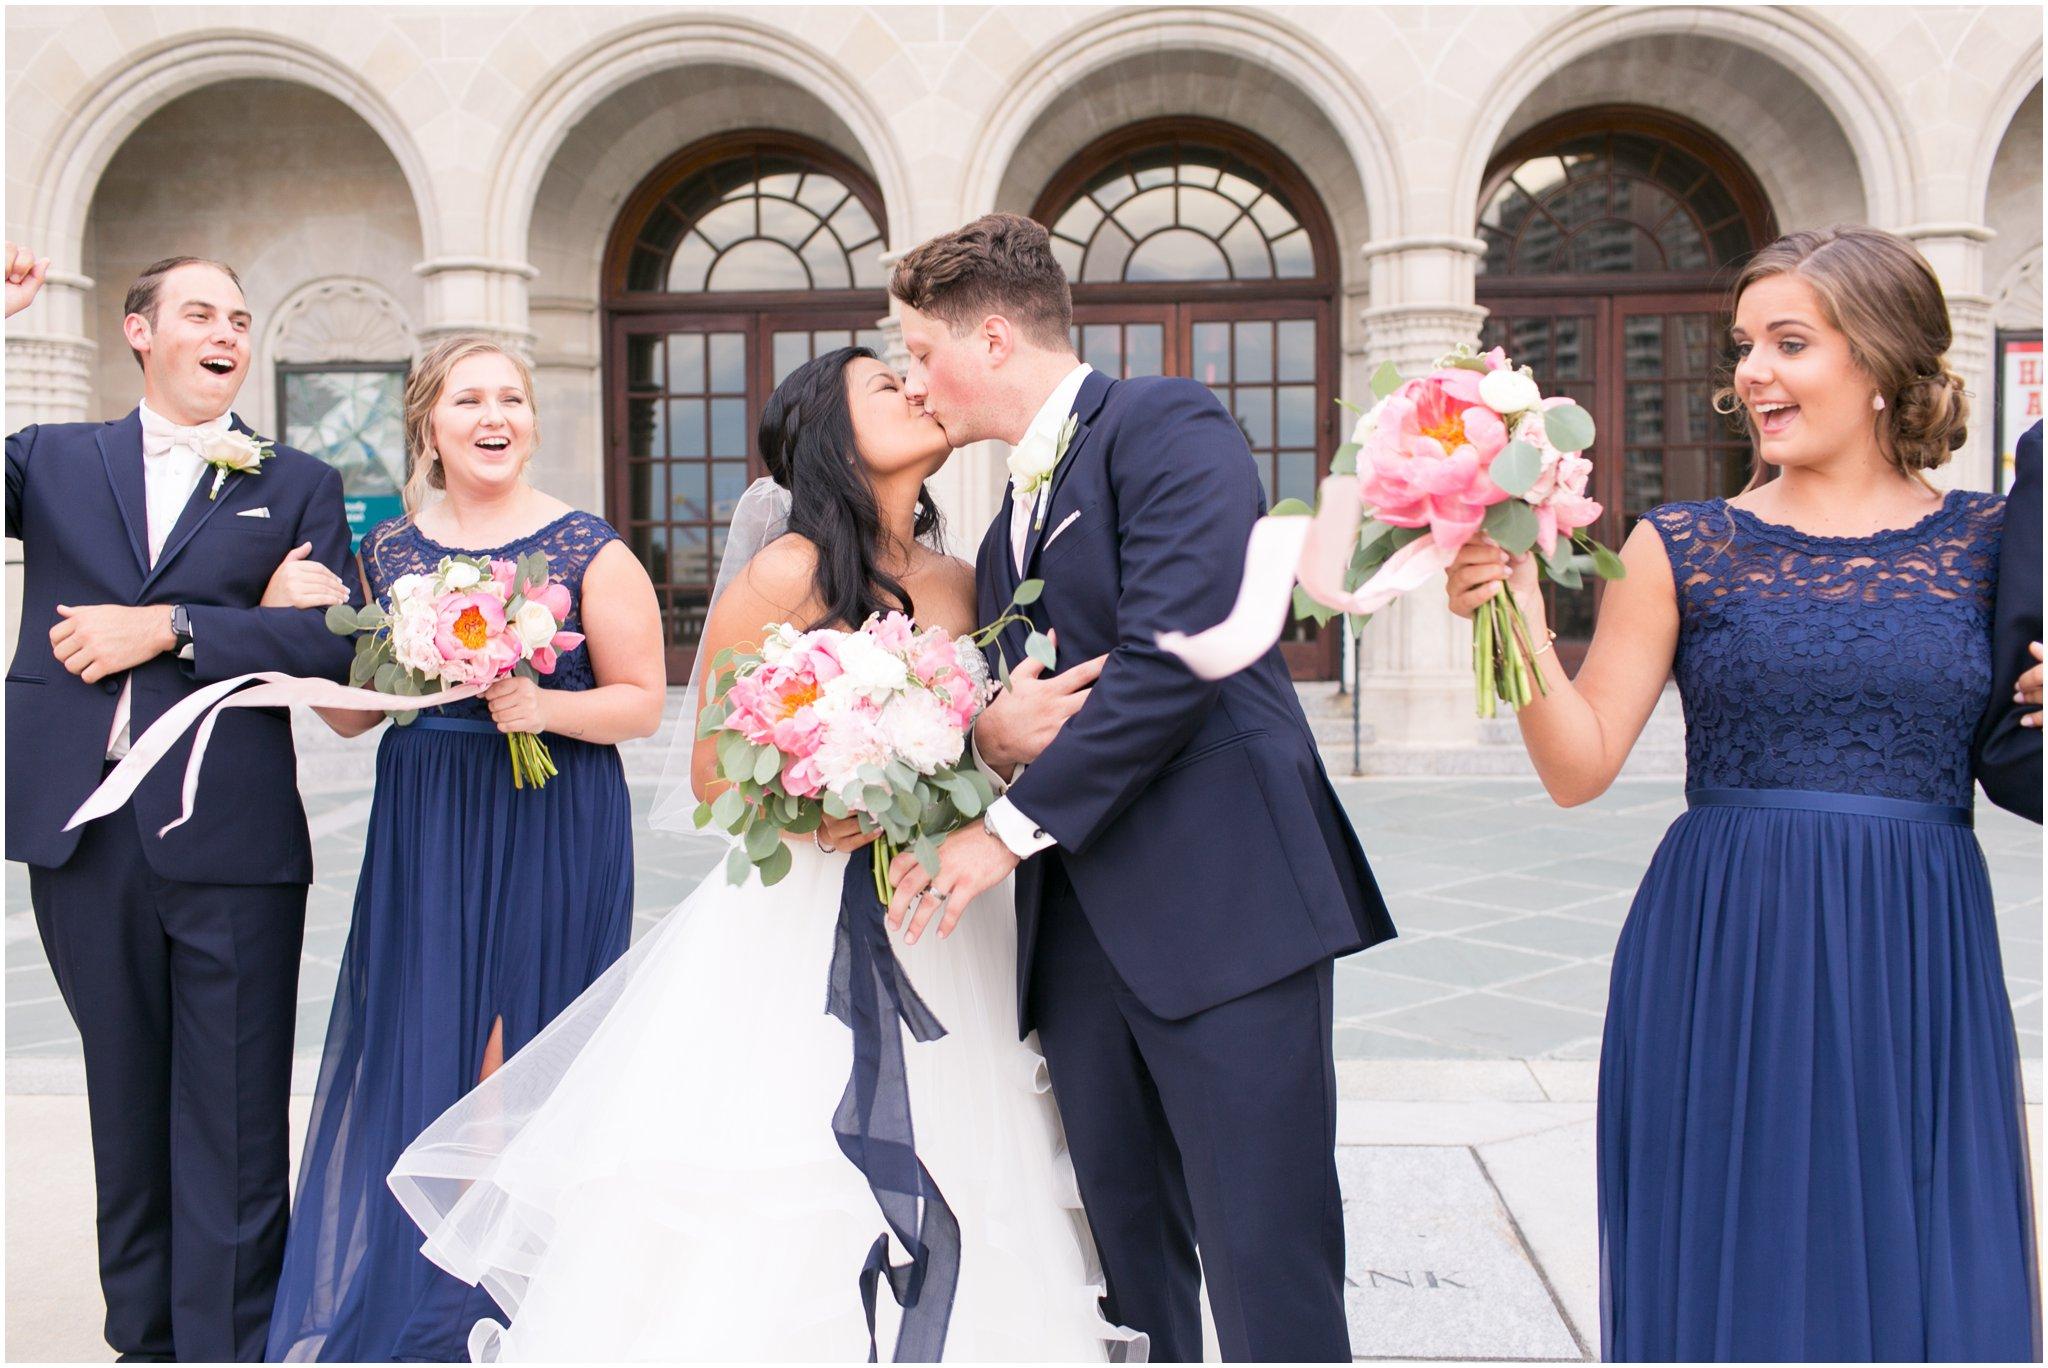 virginia wedding photography, norfolk wedding, norfolk chrysler museum wedding, chrysler museum wedding